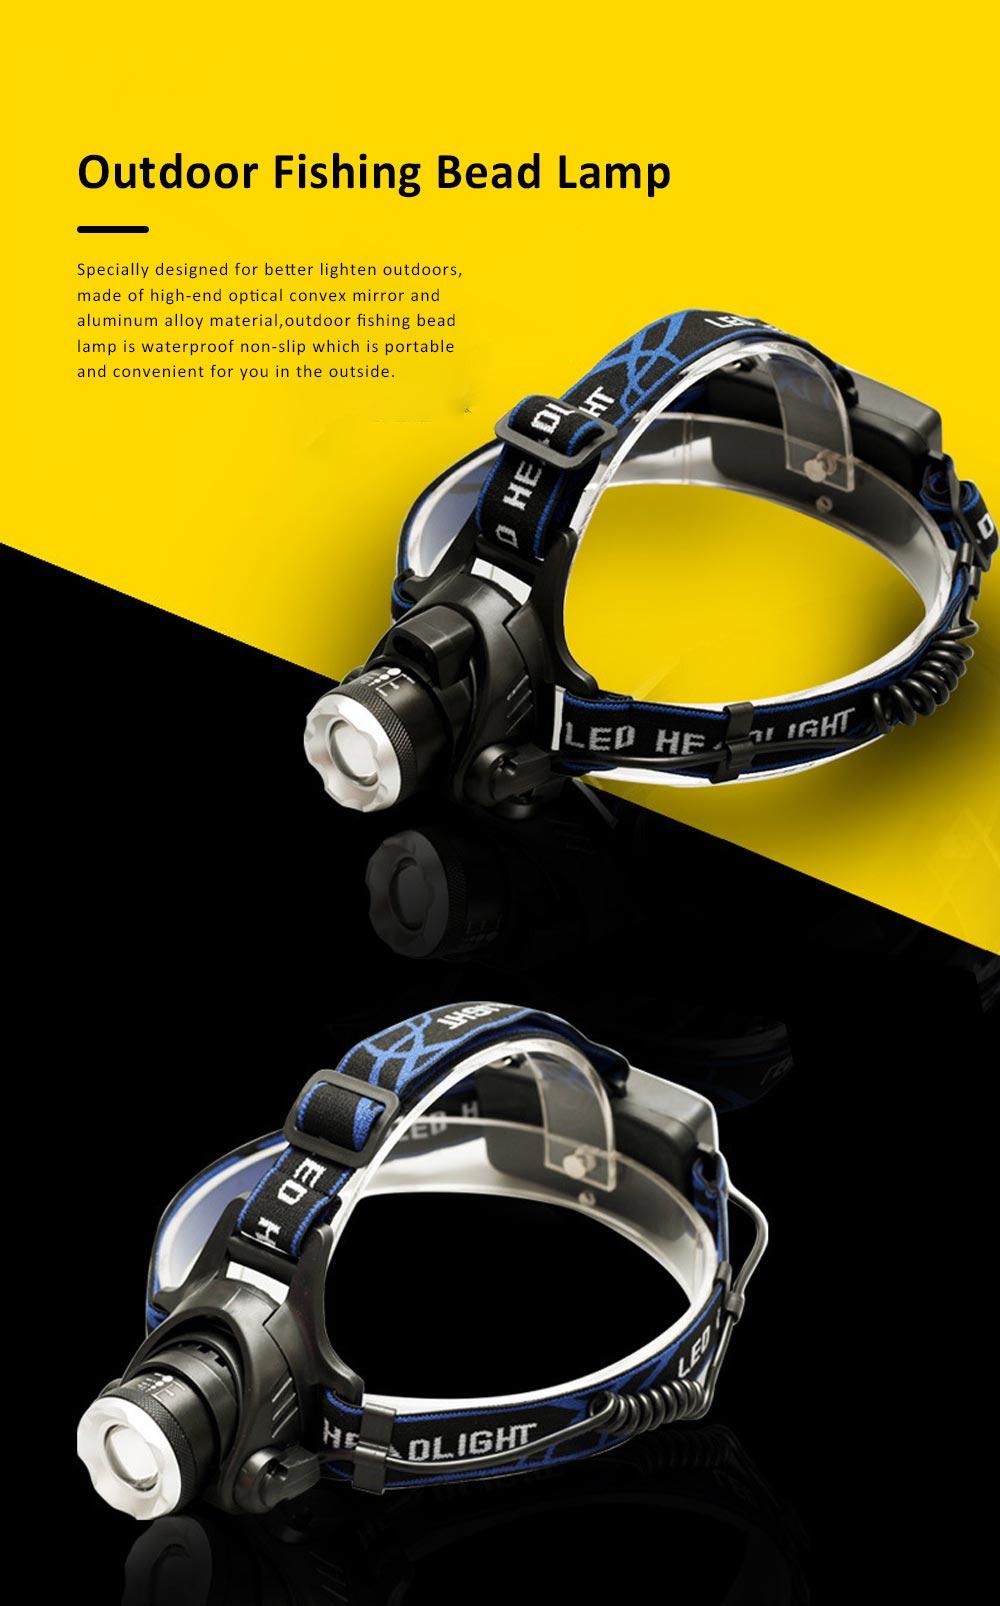 Retractable Adjustable Waterproof LED Strong Light Zoom Outdoor Fishing Bead Lamp with Elastic Light Belt 0